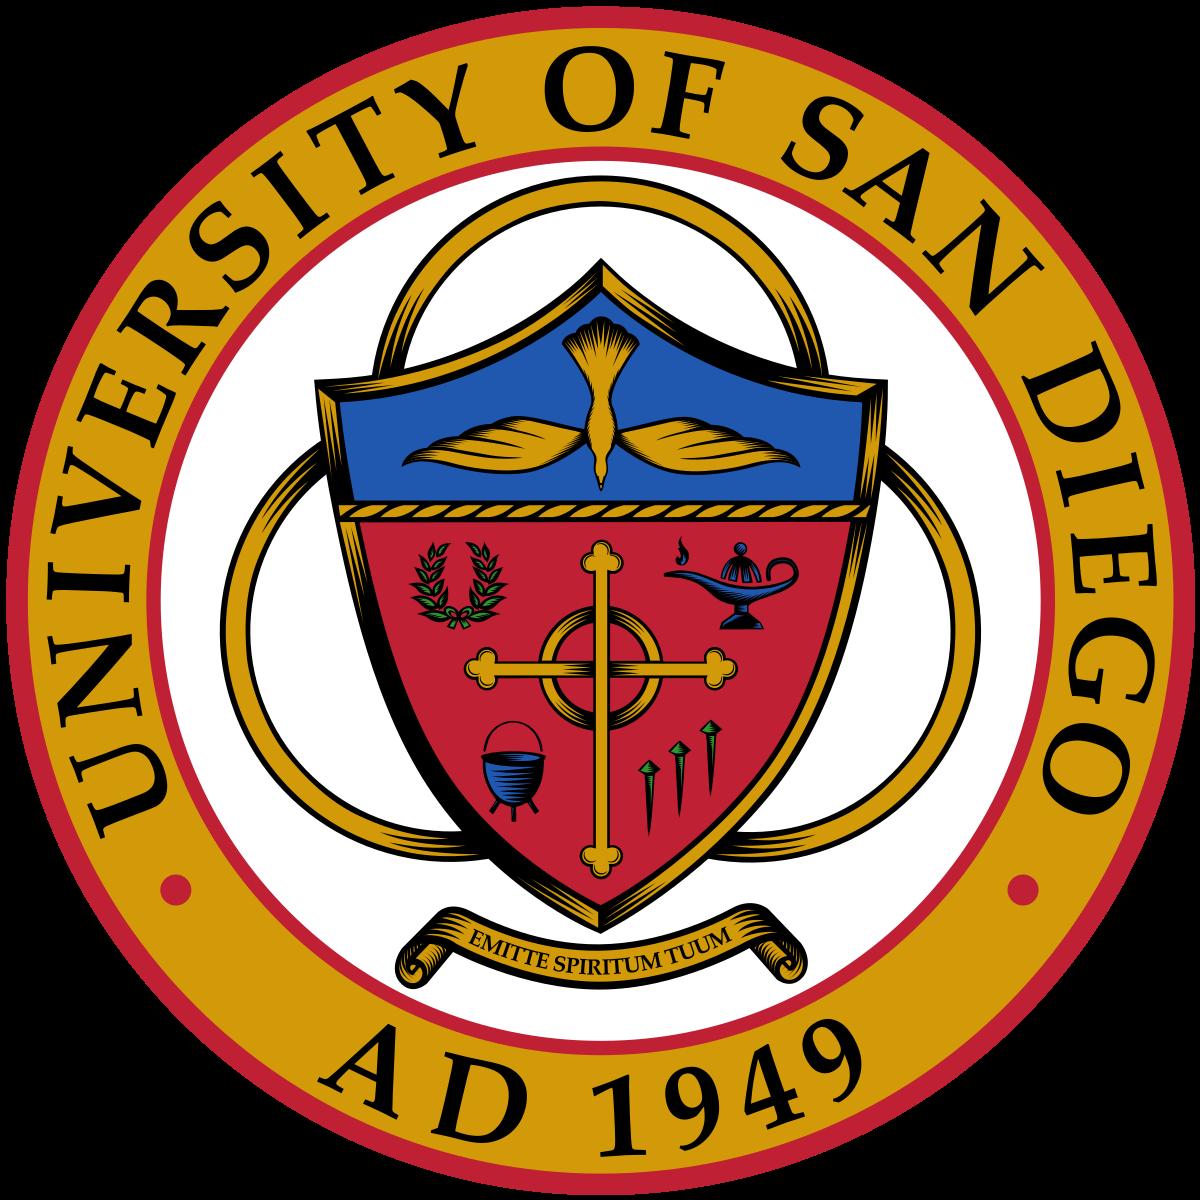 University of San Diego.